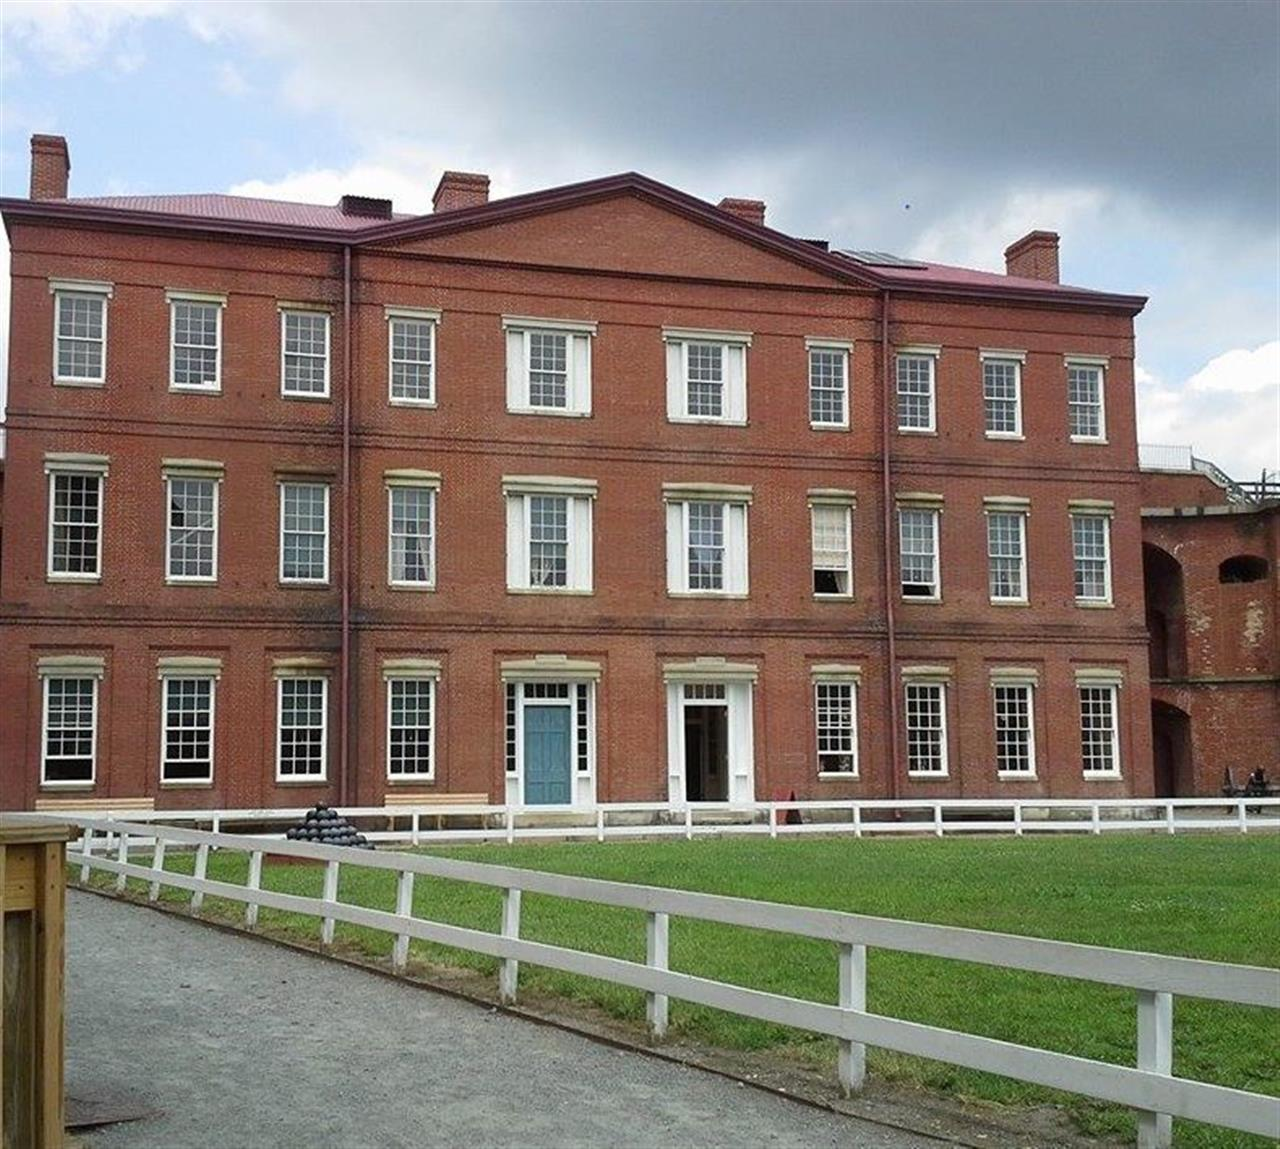 Historic Fort Delaware Delaware City, DE http://www.delawarecity.com/history